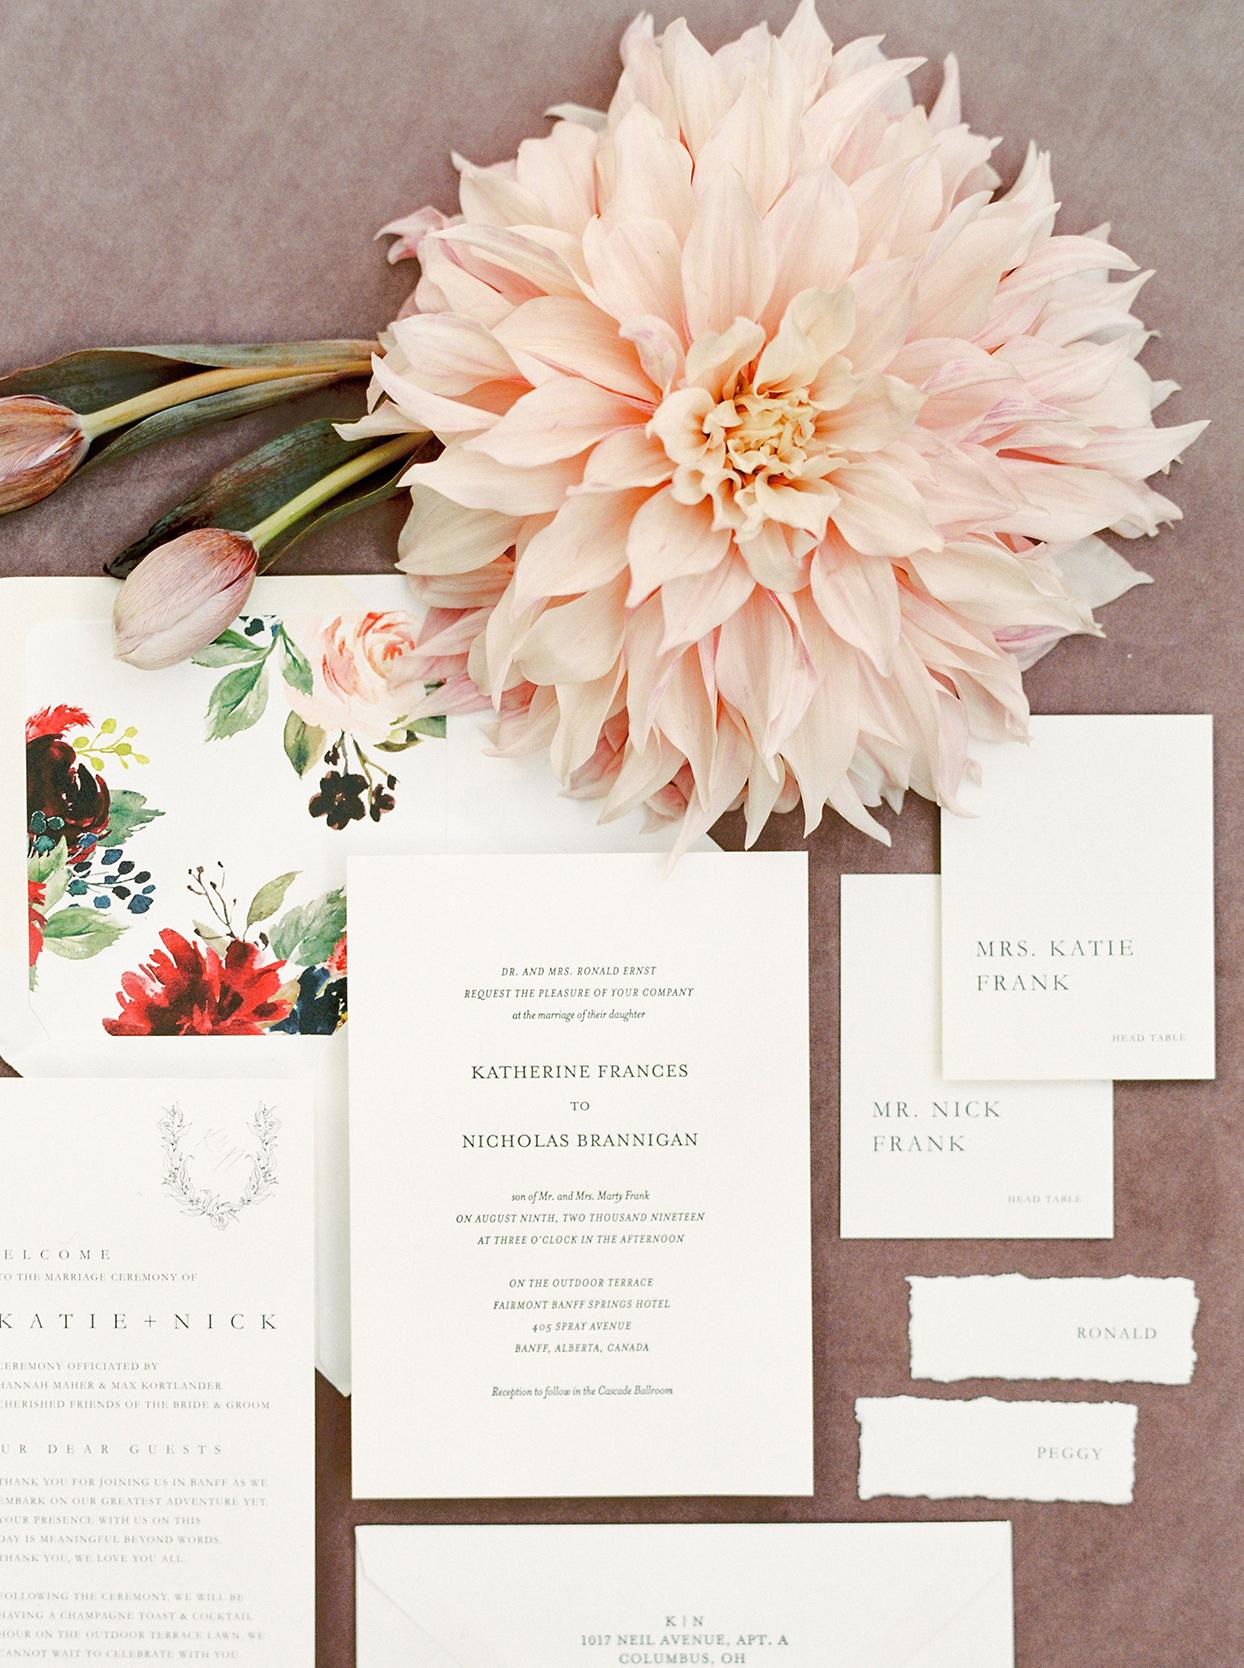 katie nicholas wedding invitations and flower